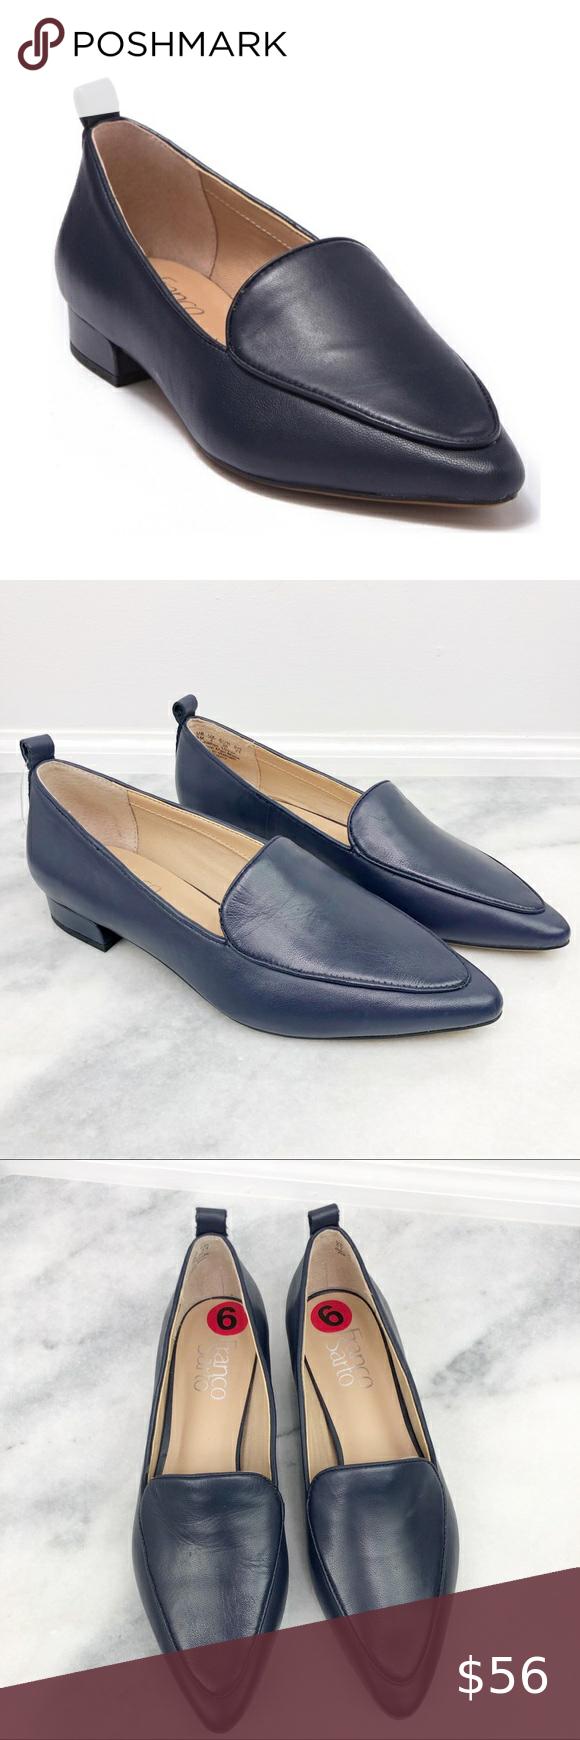 Franco Sarto Studio Pointed Toe Leather